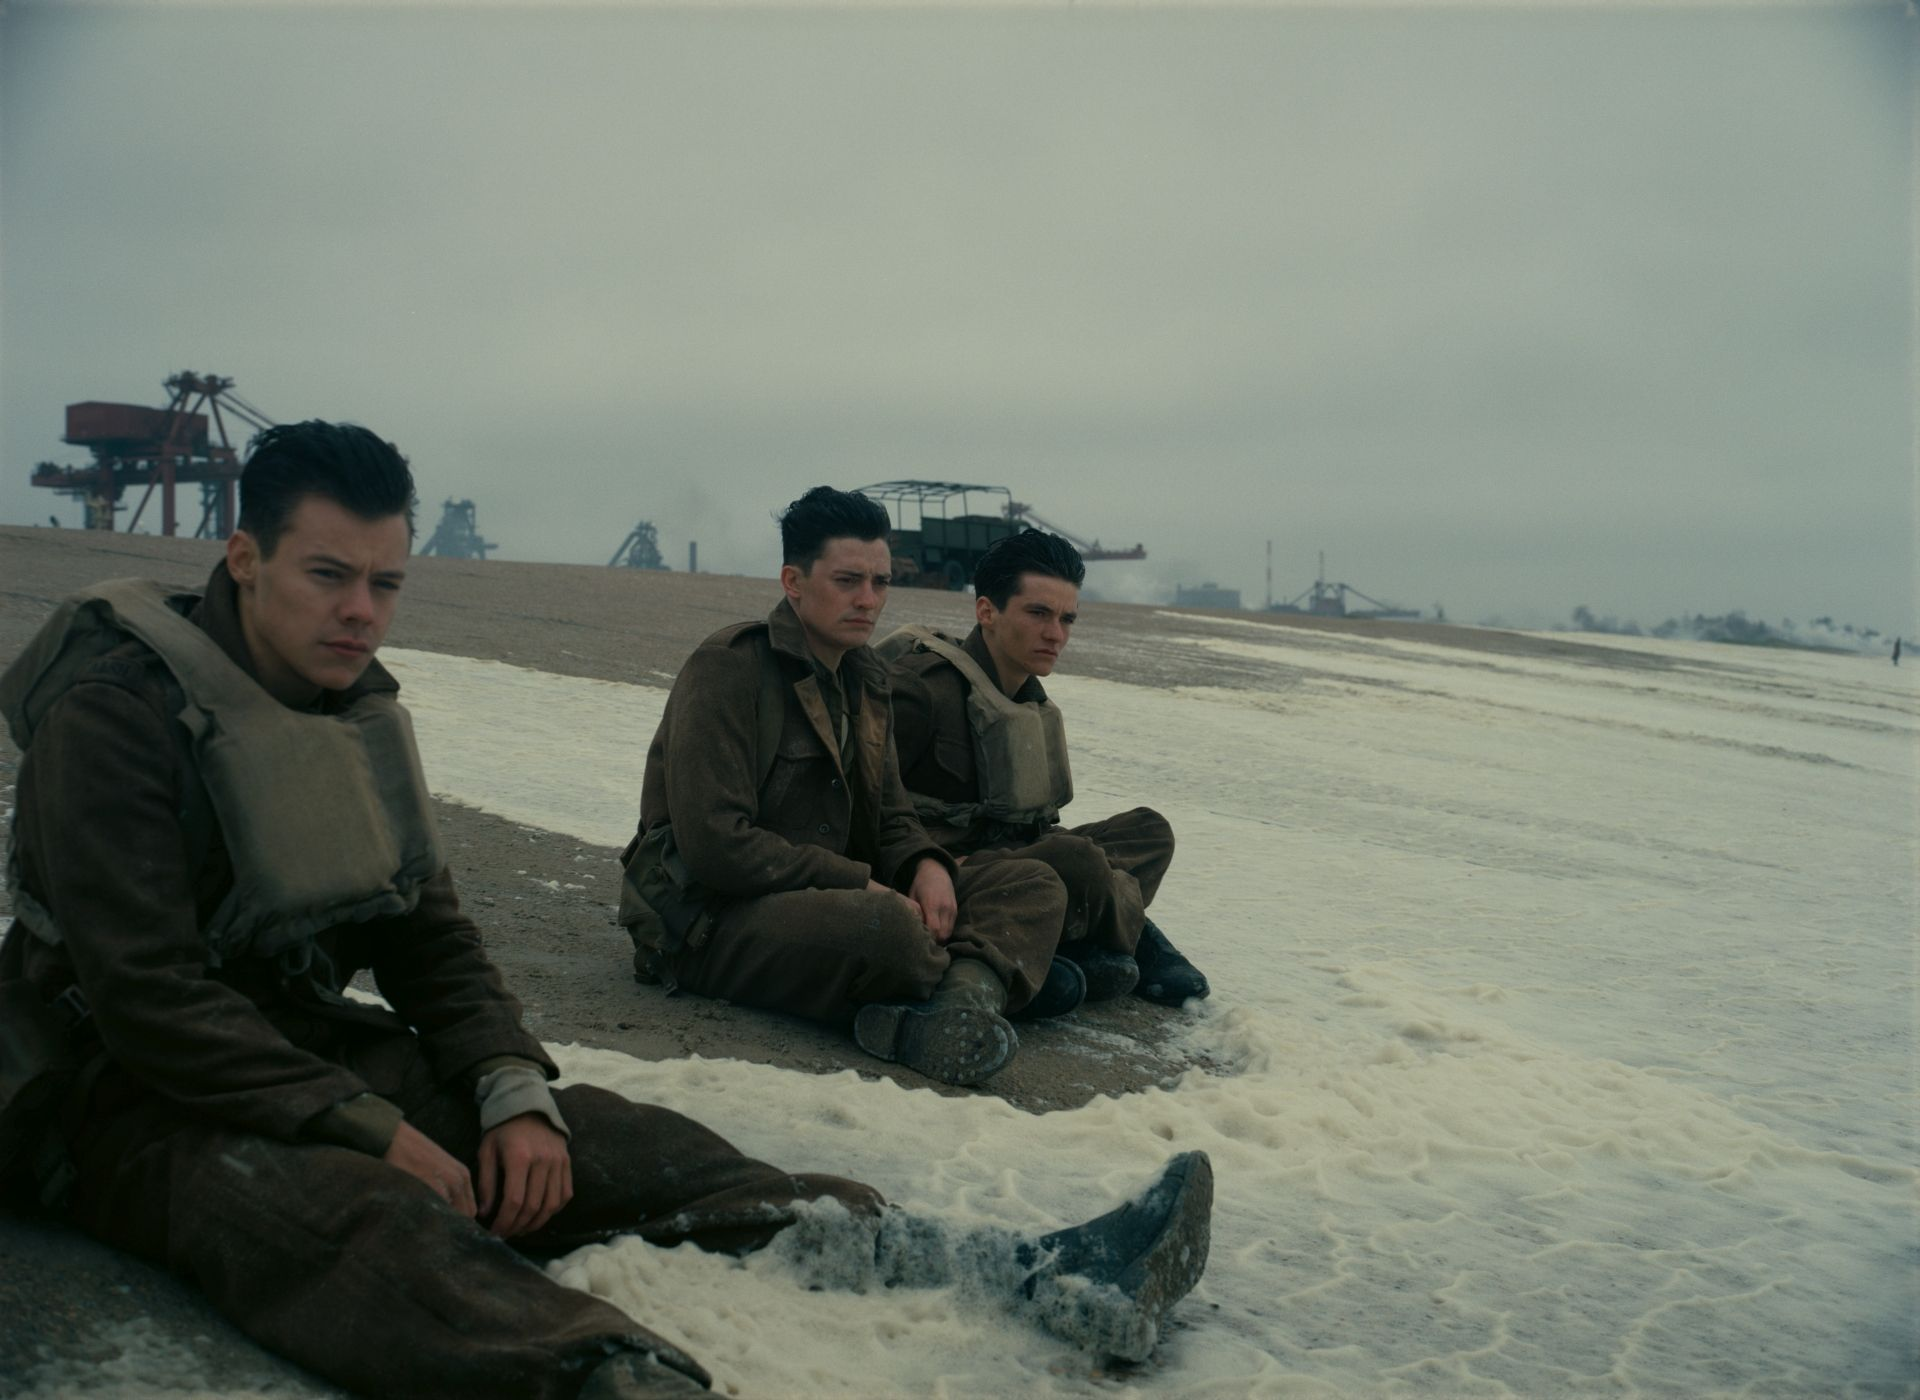 Dunkirk - Harry Styles as Alex